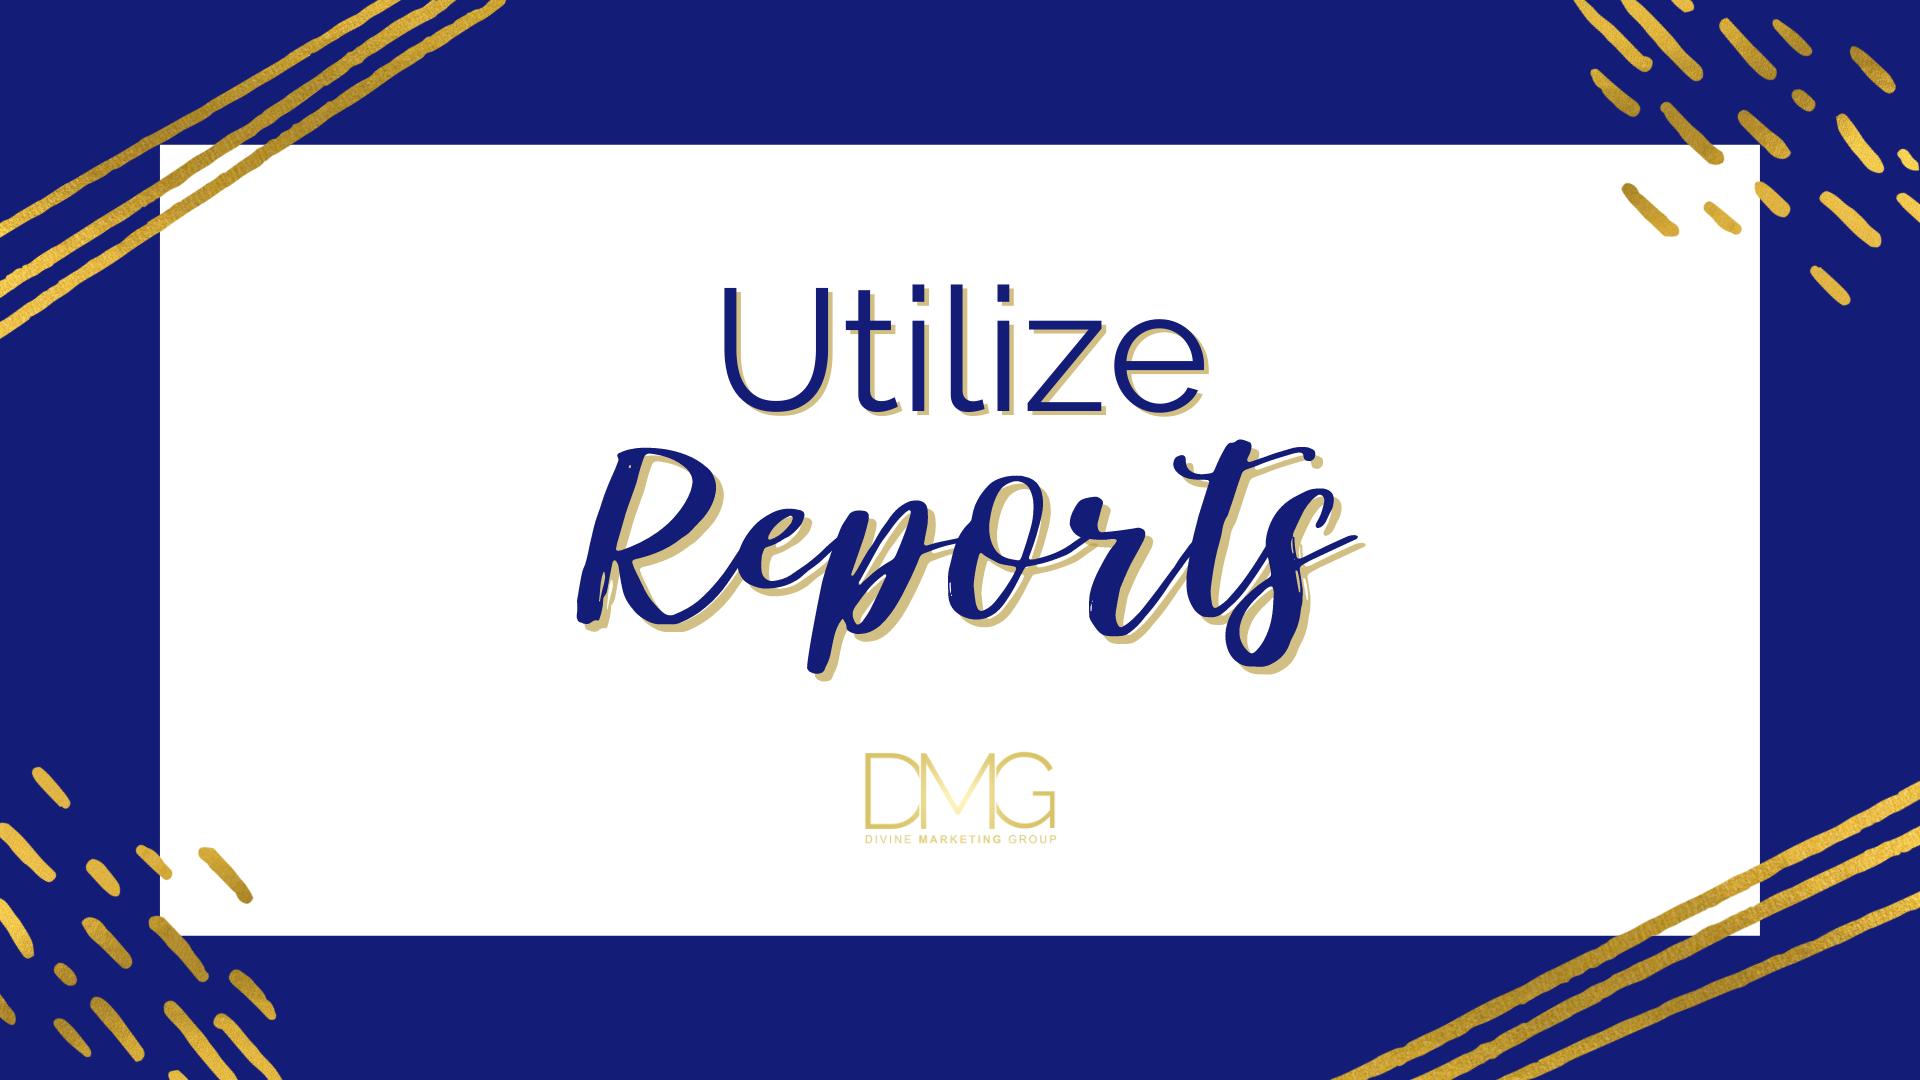 Utilize Reports